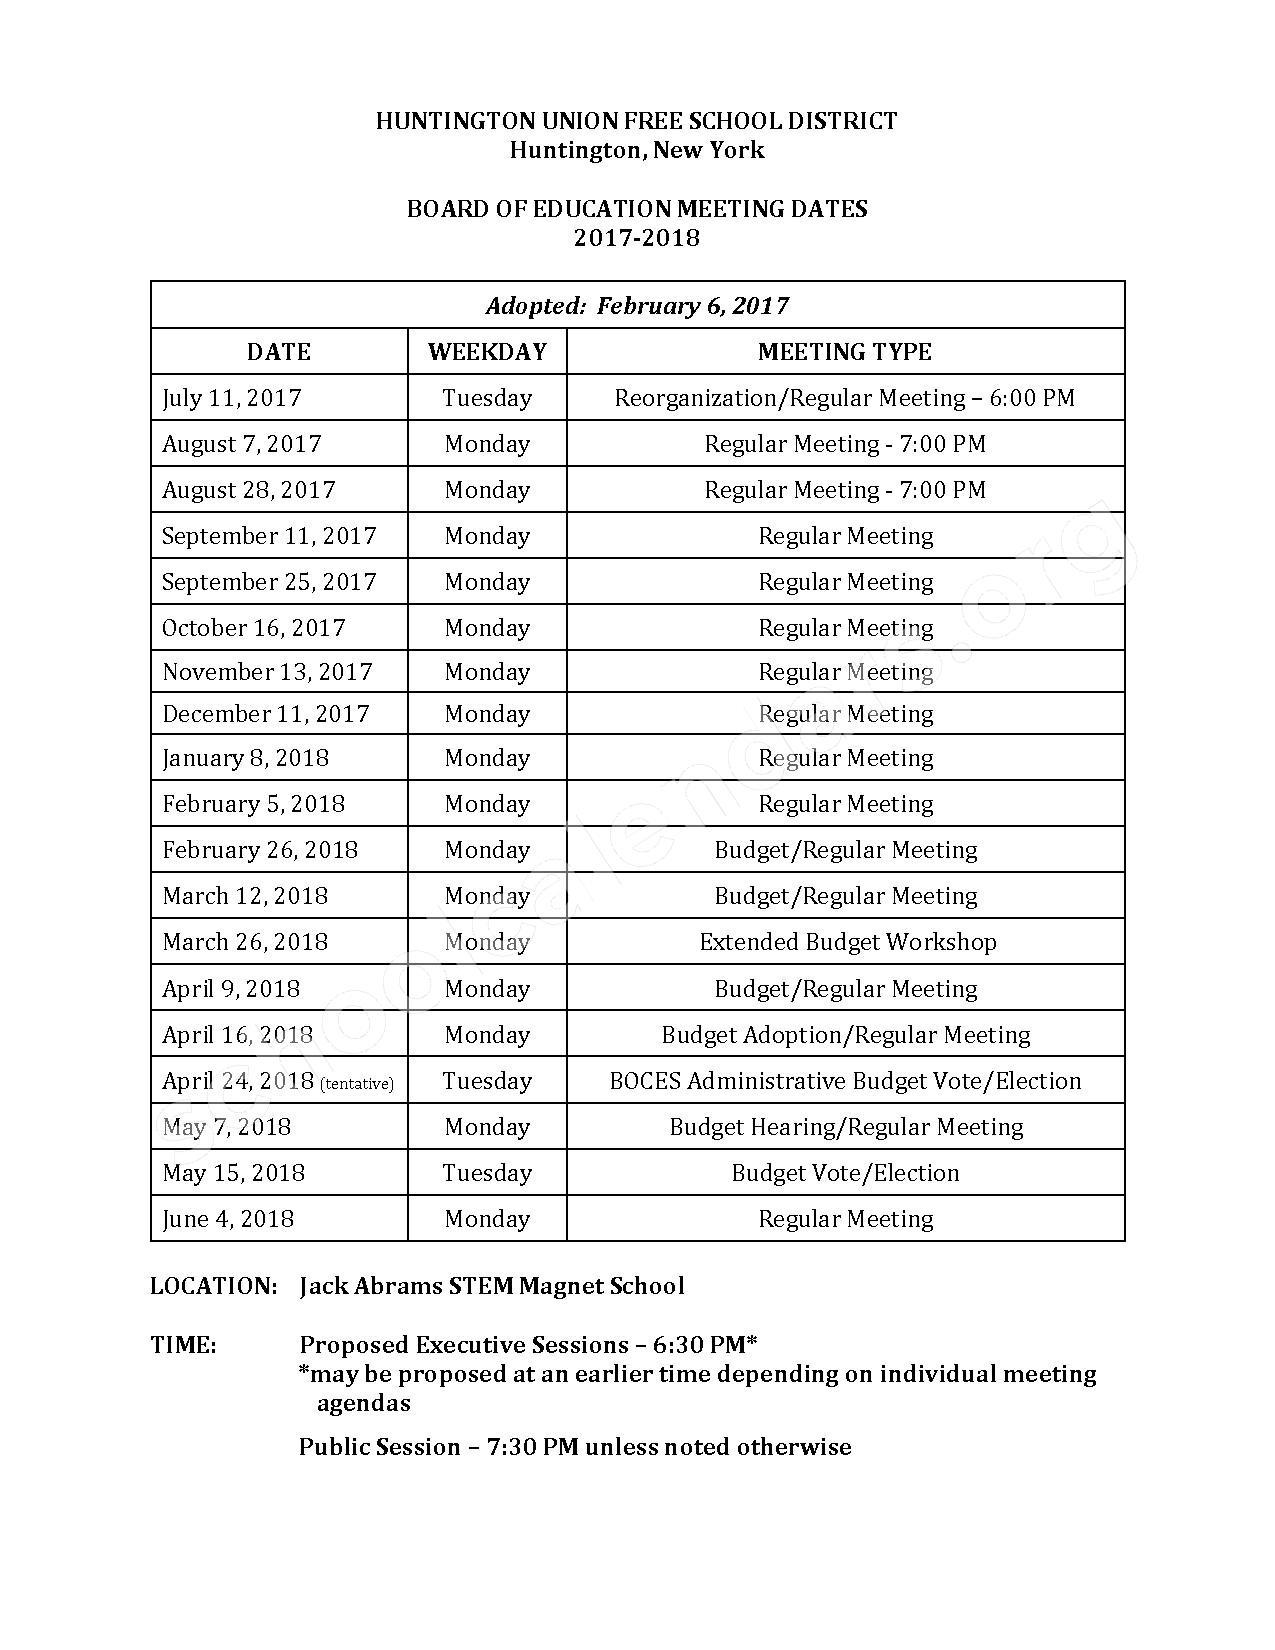 2017 - 2018 Board Meeting Calendar – Huntington Union Free School District – page 1